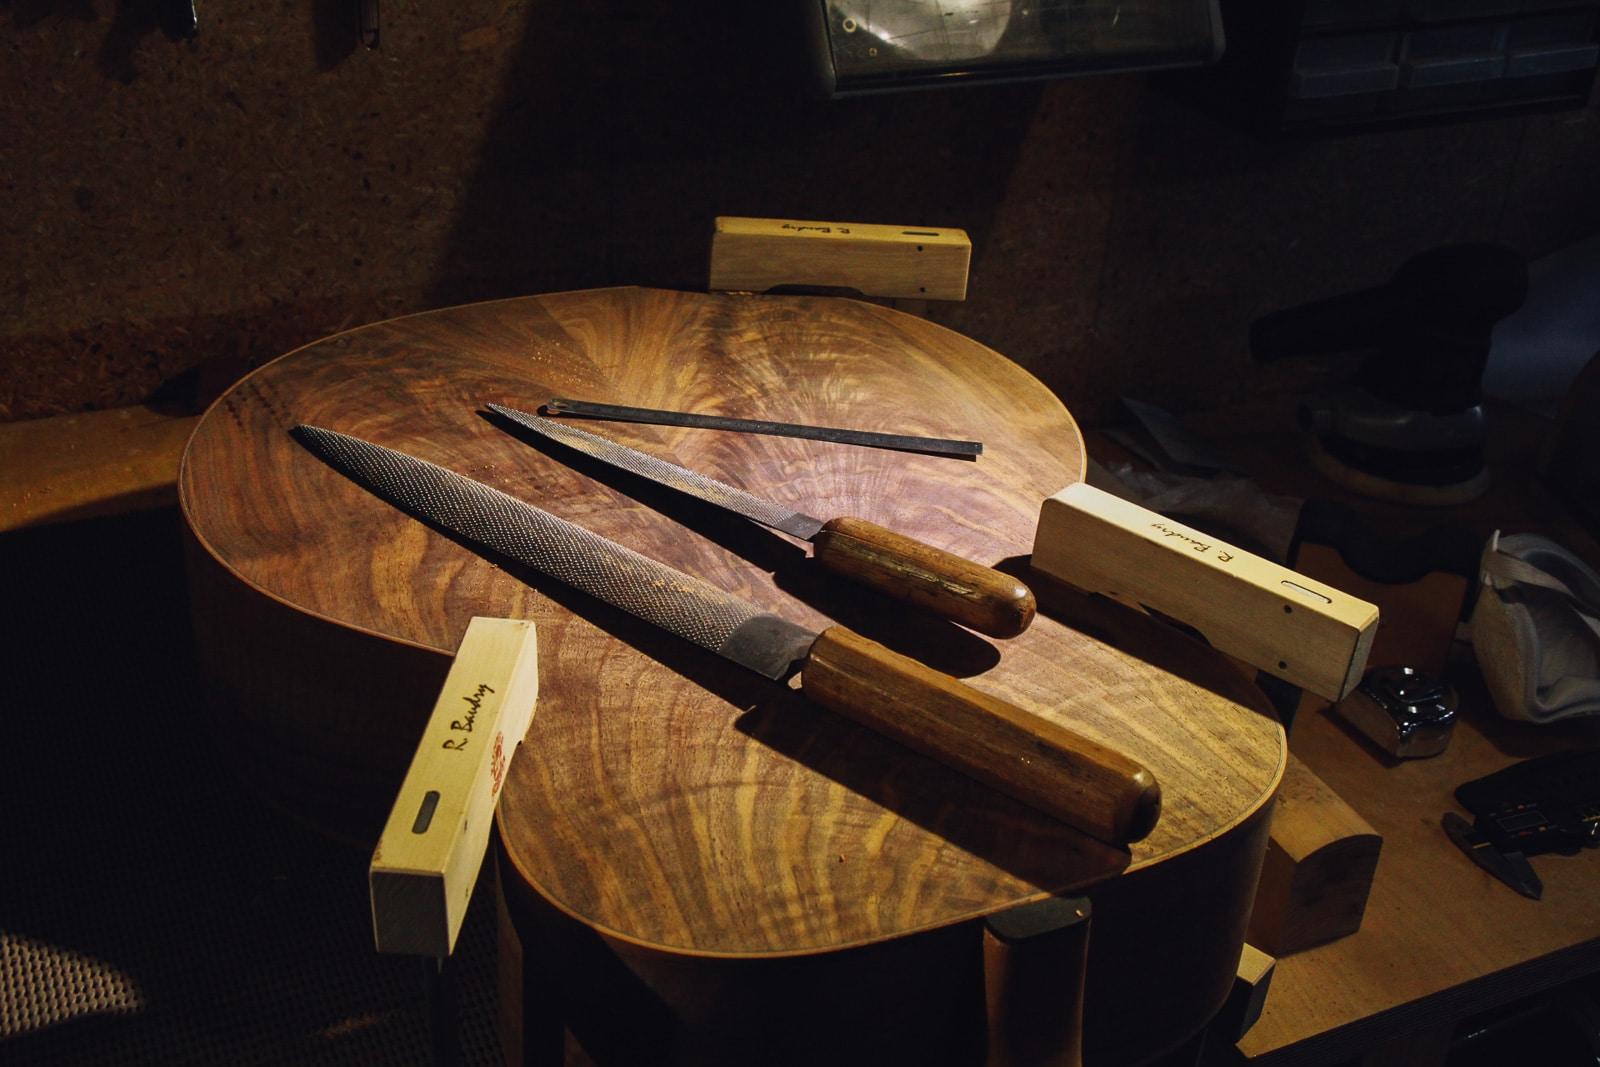 Outils de luthier - formation luthier guitare